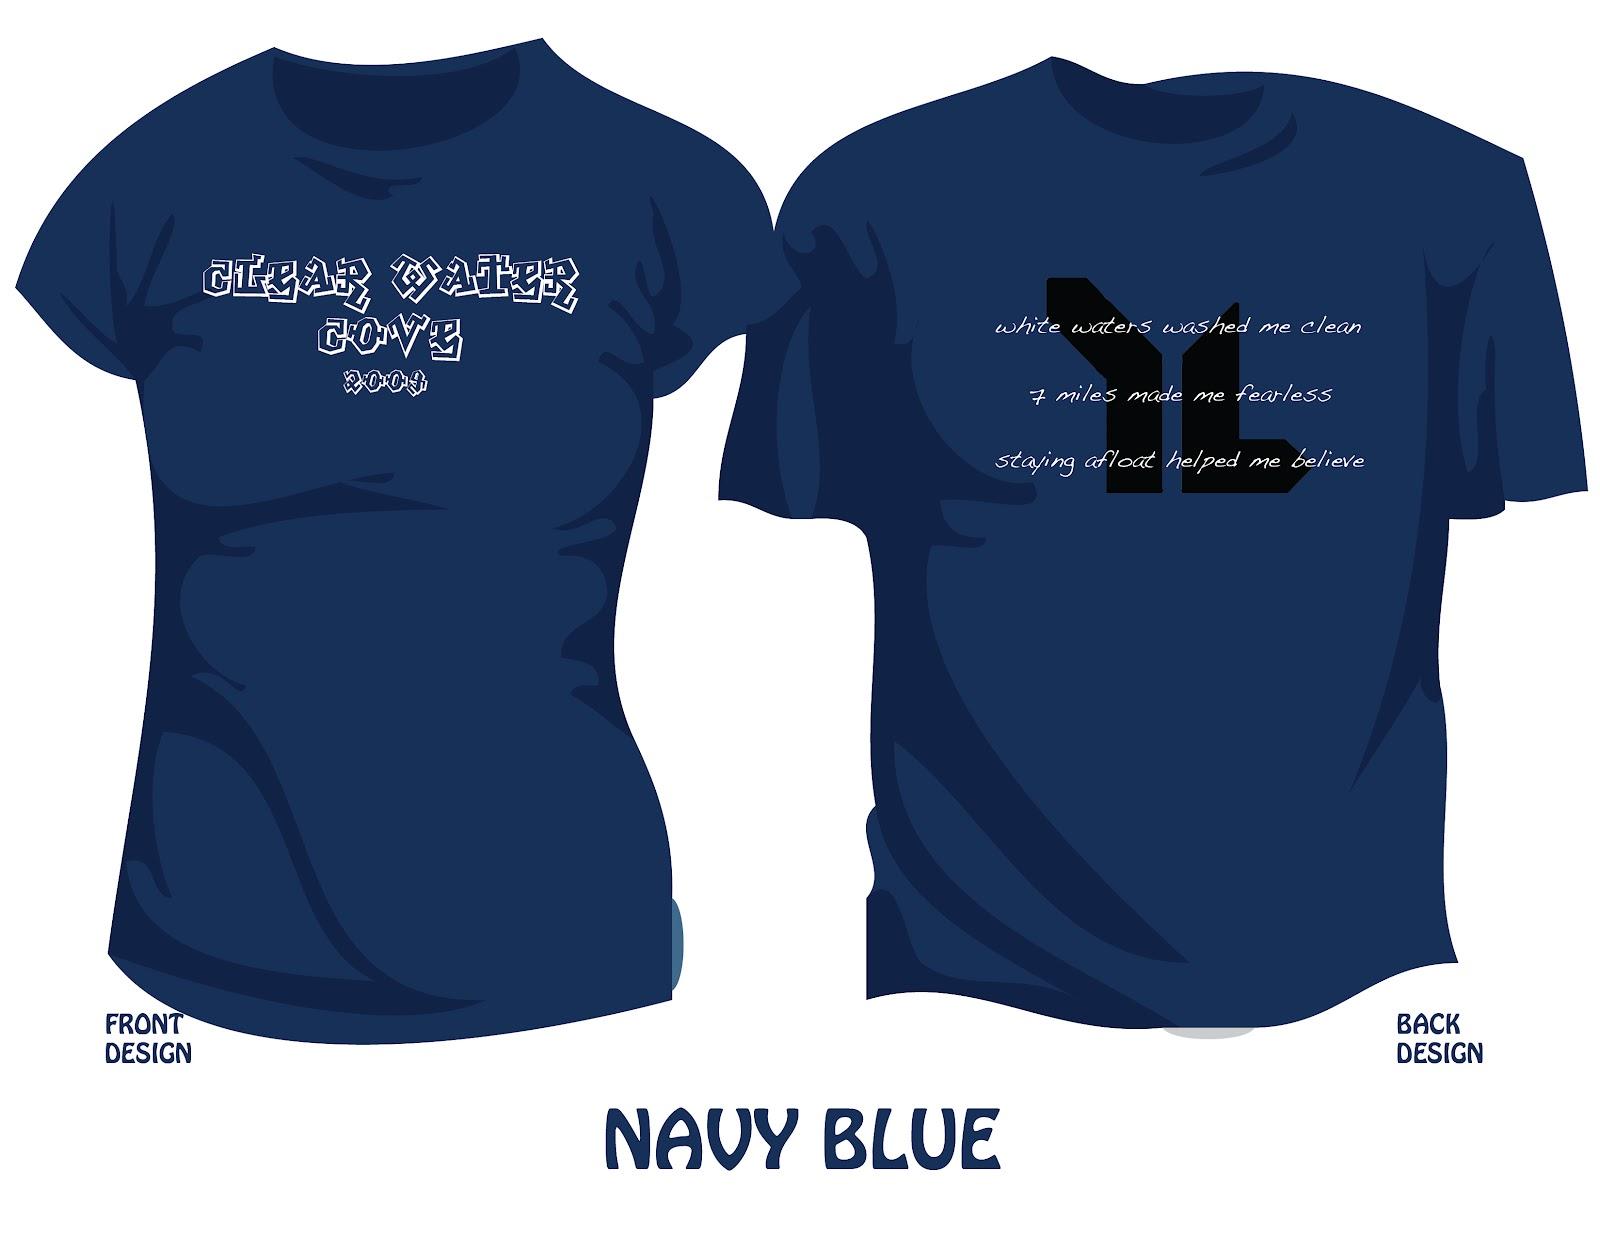 Design t shirt program - Below Are T Shirt Designs For Programs Inside A College Program